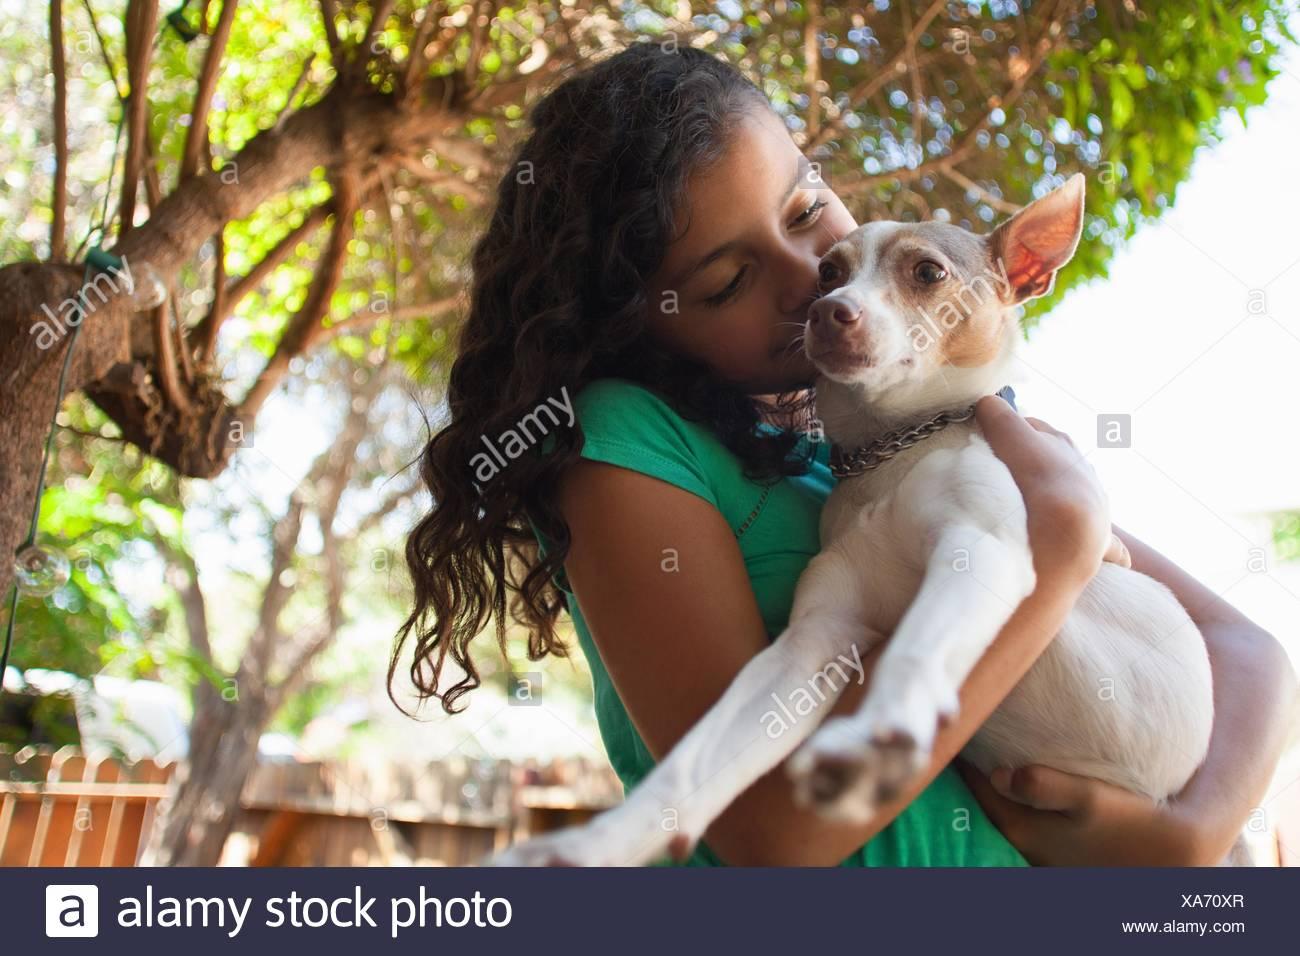 Portrait of girl in garden hugging dog - Stock Image